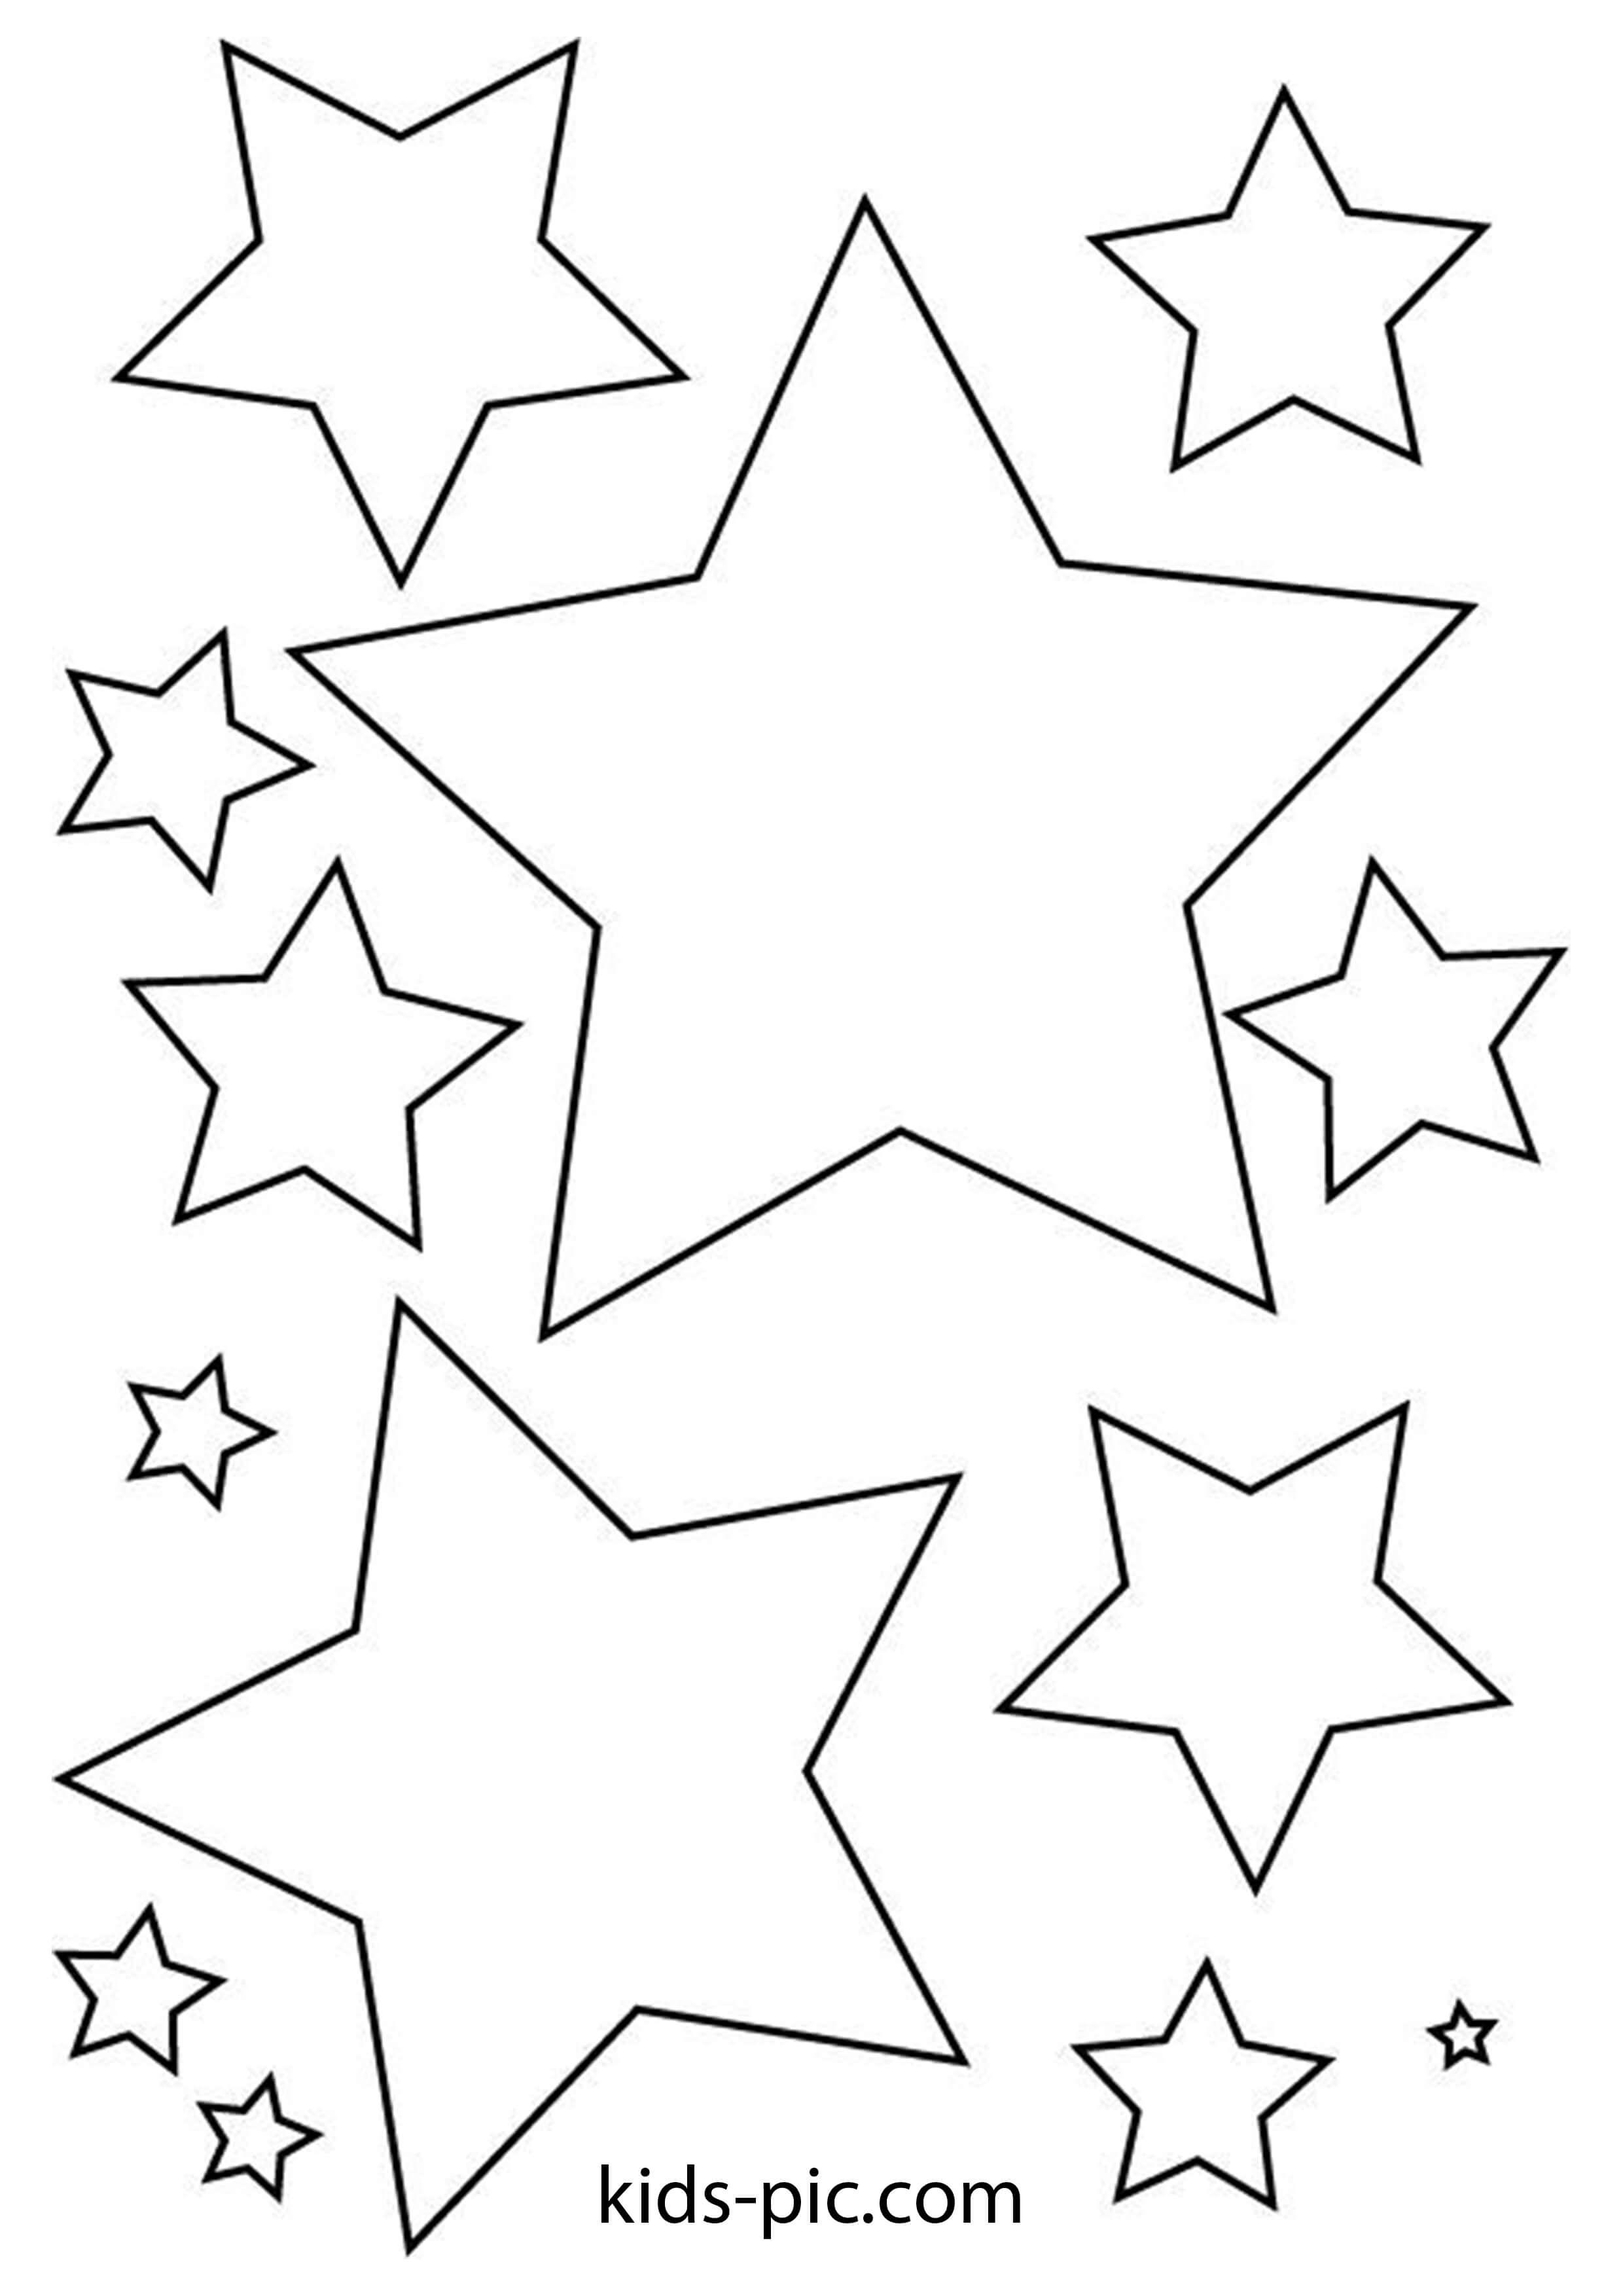 шаблон звезды для вырезания из бумаги Kids Pic Com